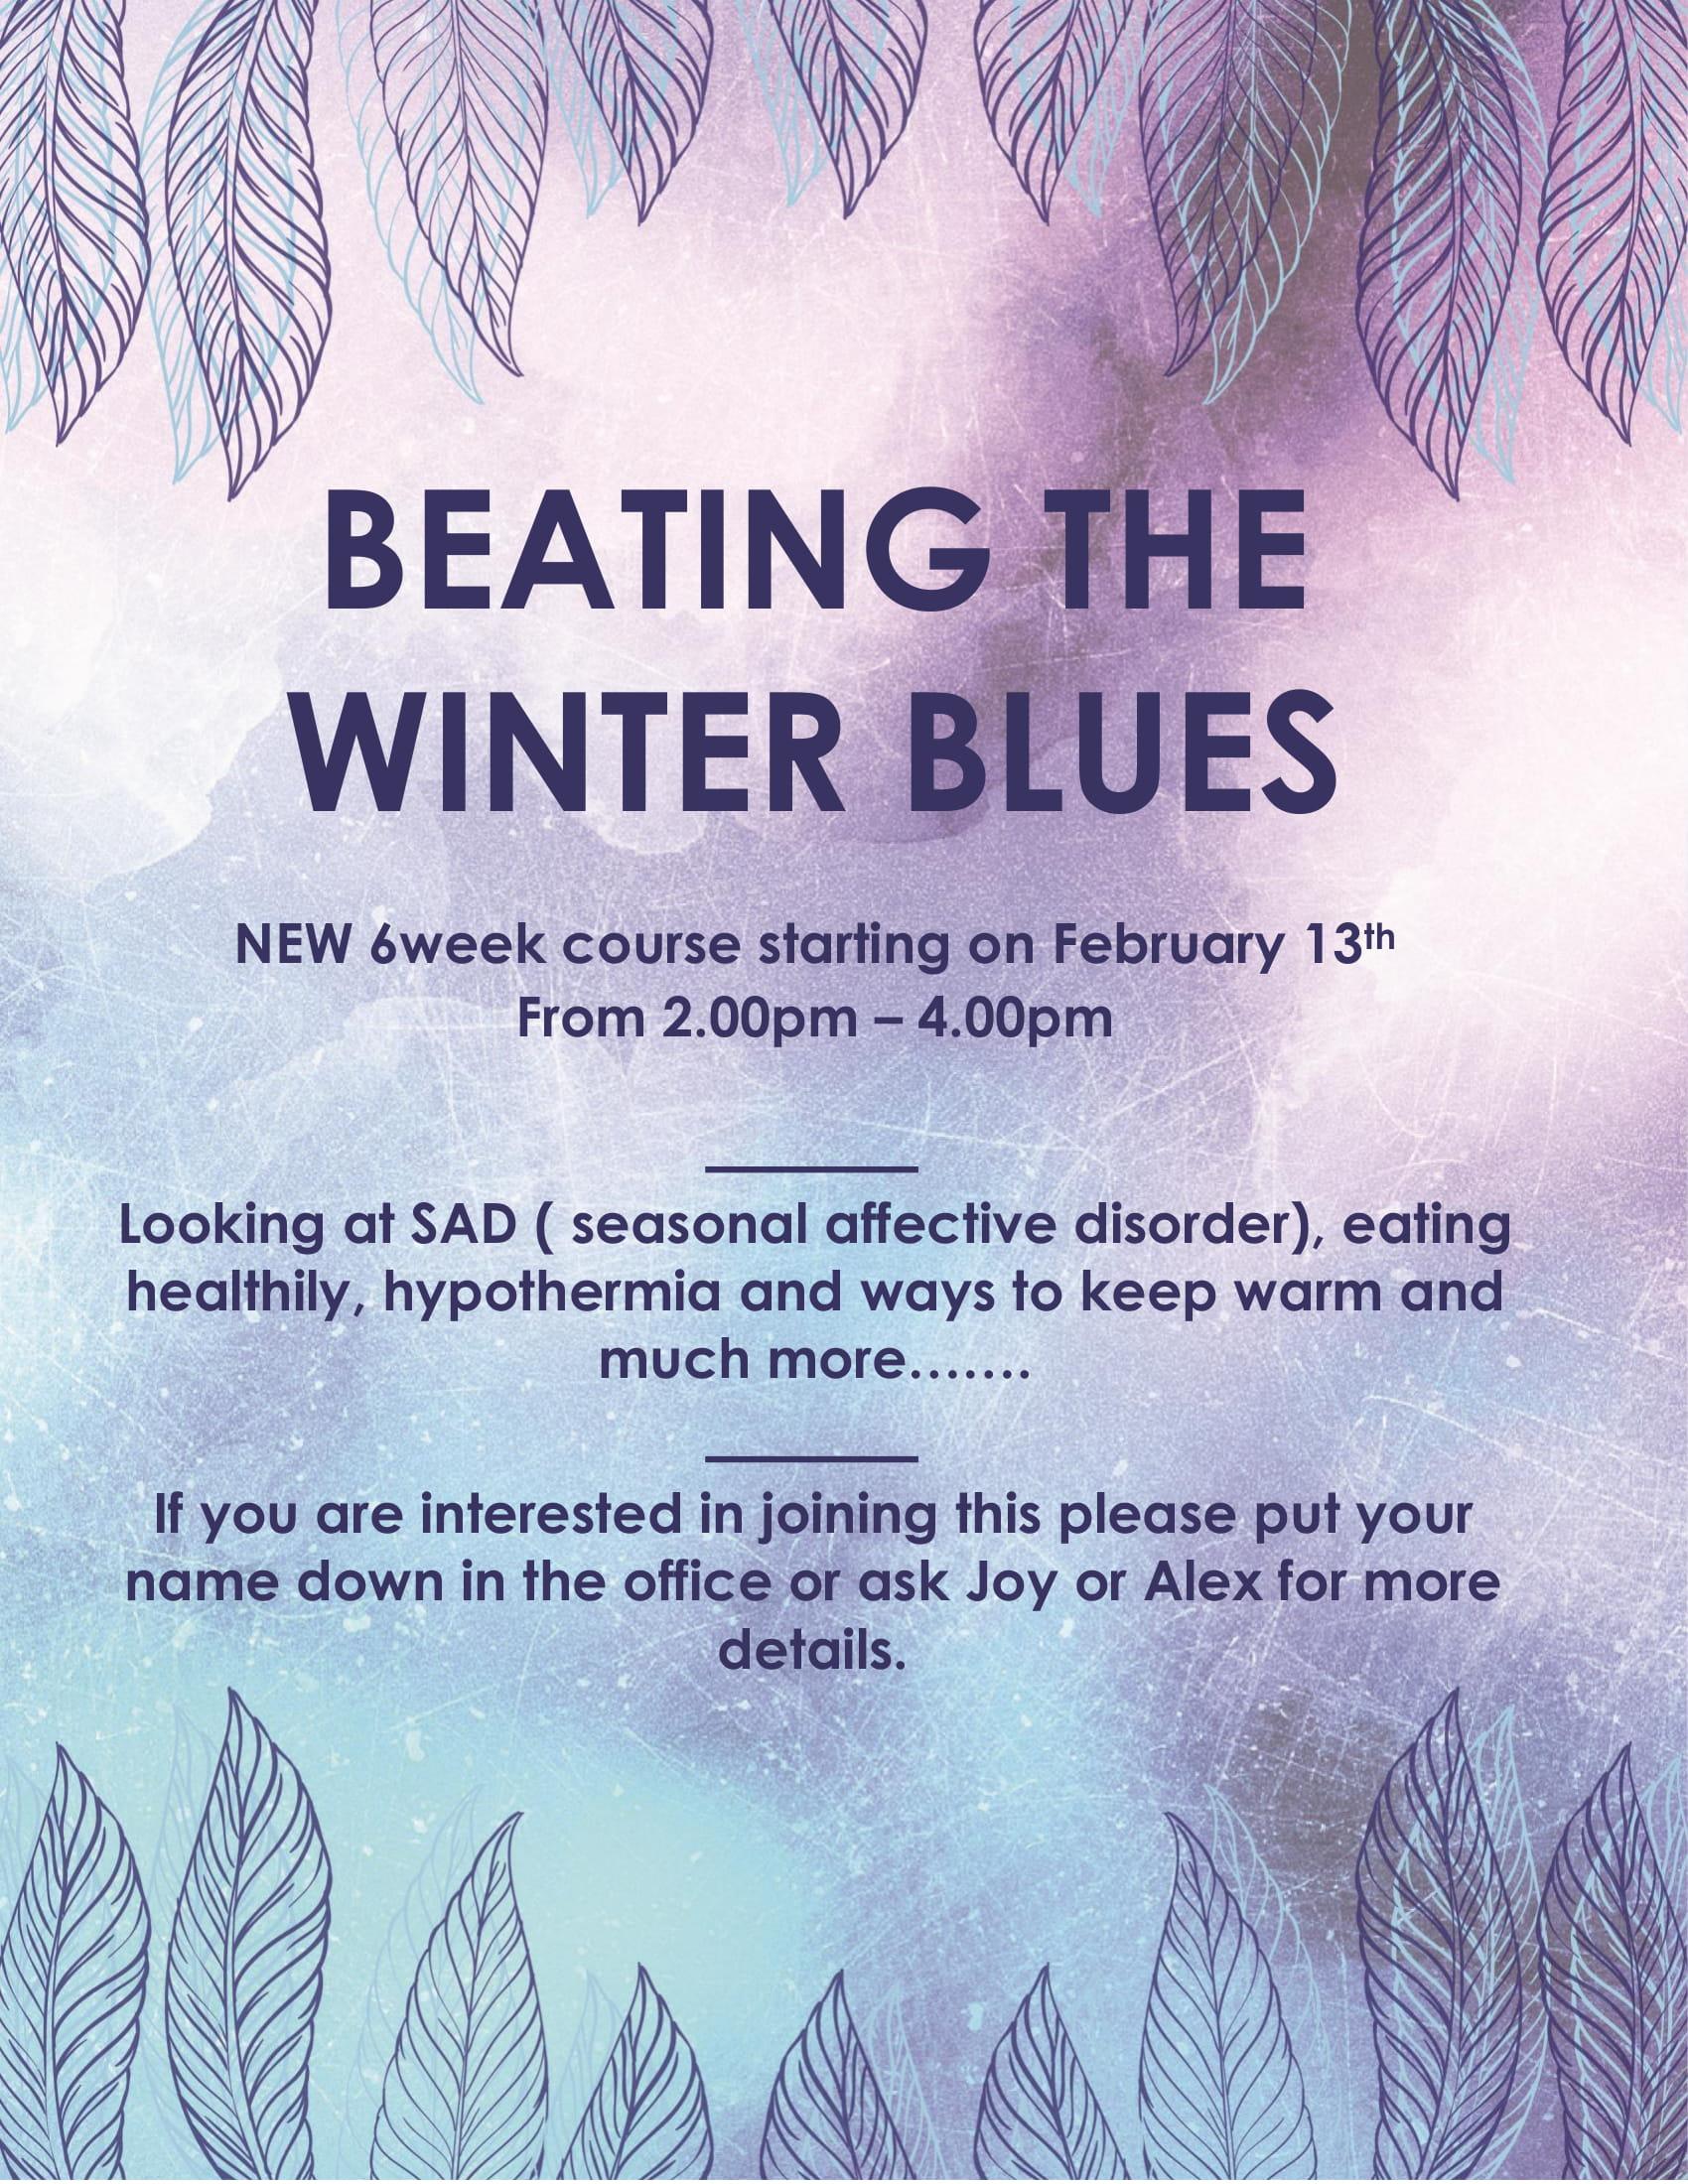 Beatin the winter blues-converted-1.jpg